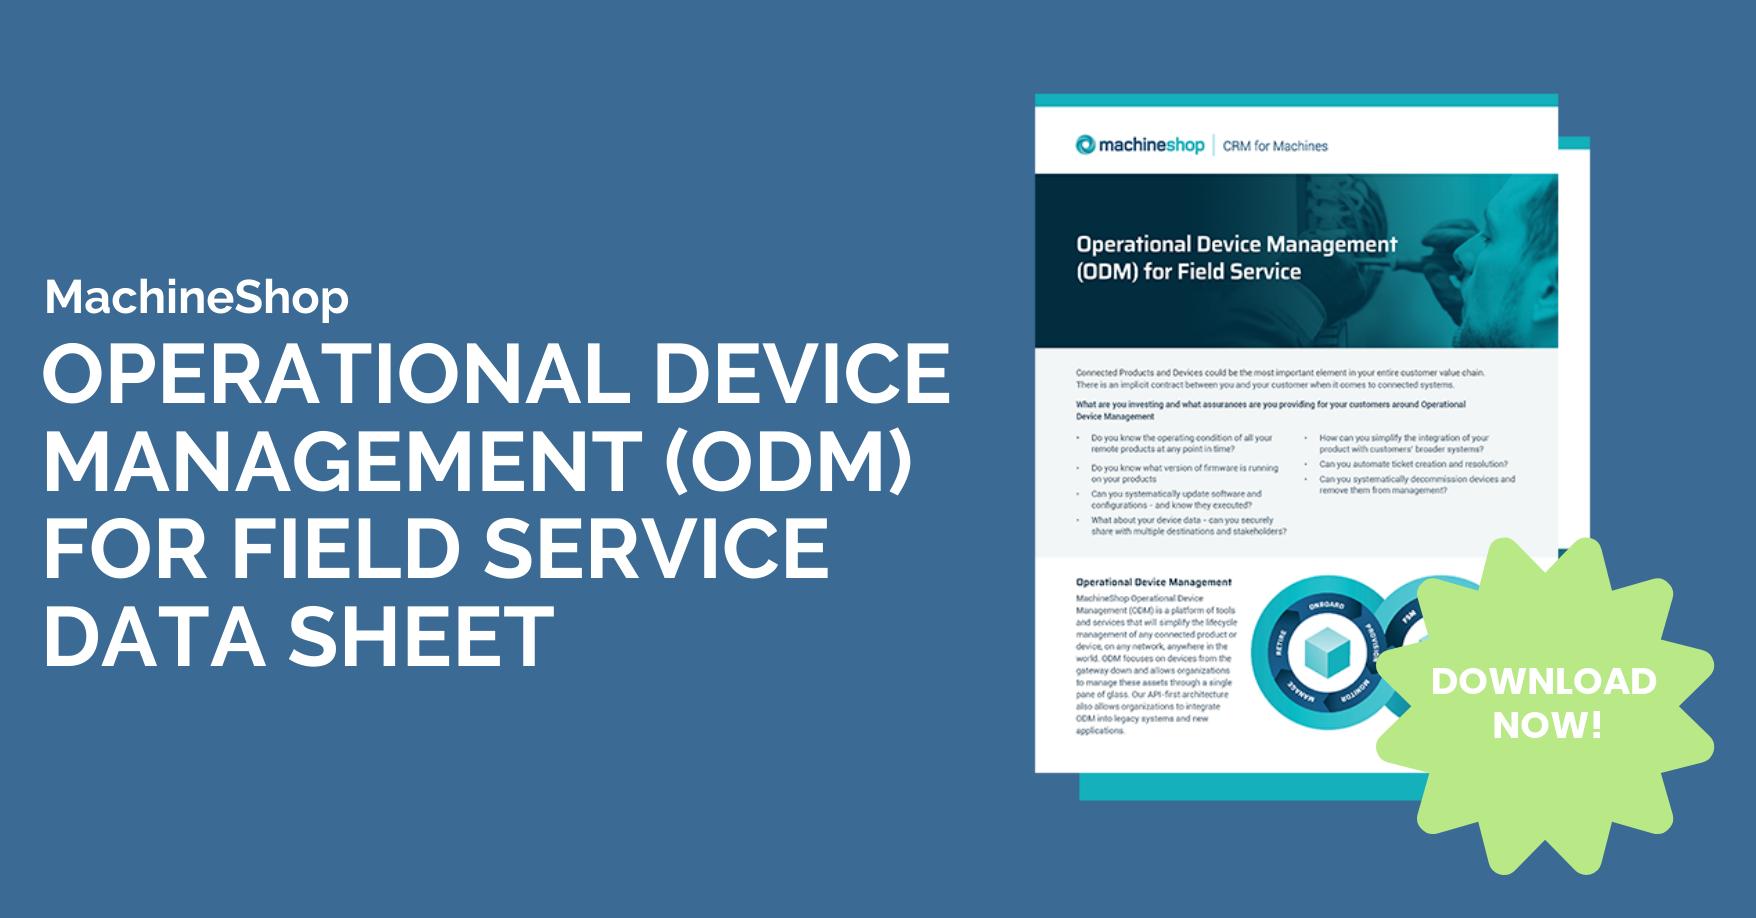 ODM-for-Field-Service-Data-Sheet-Banner